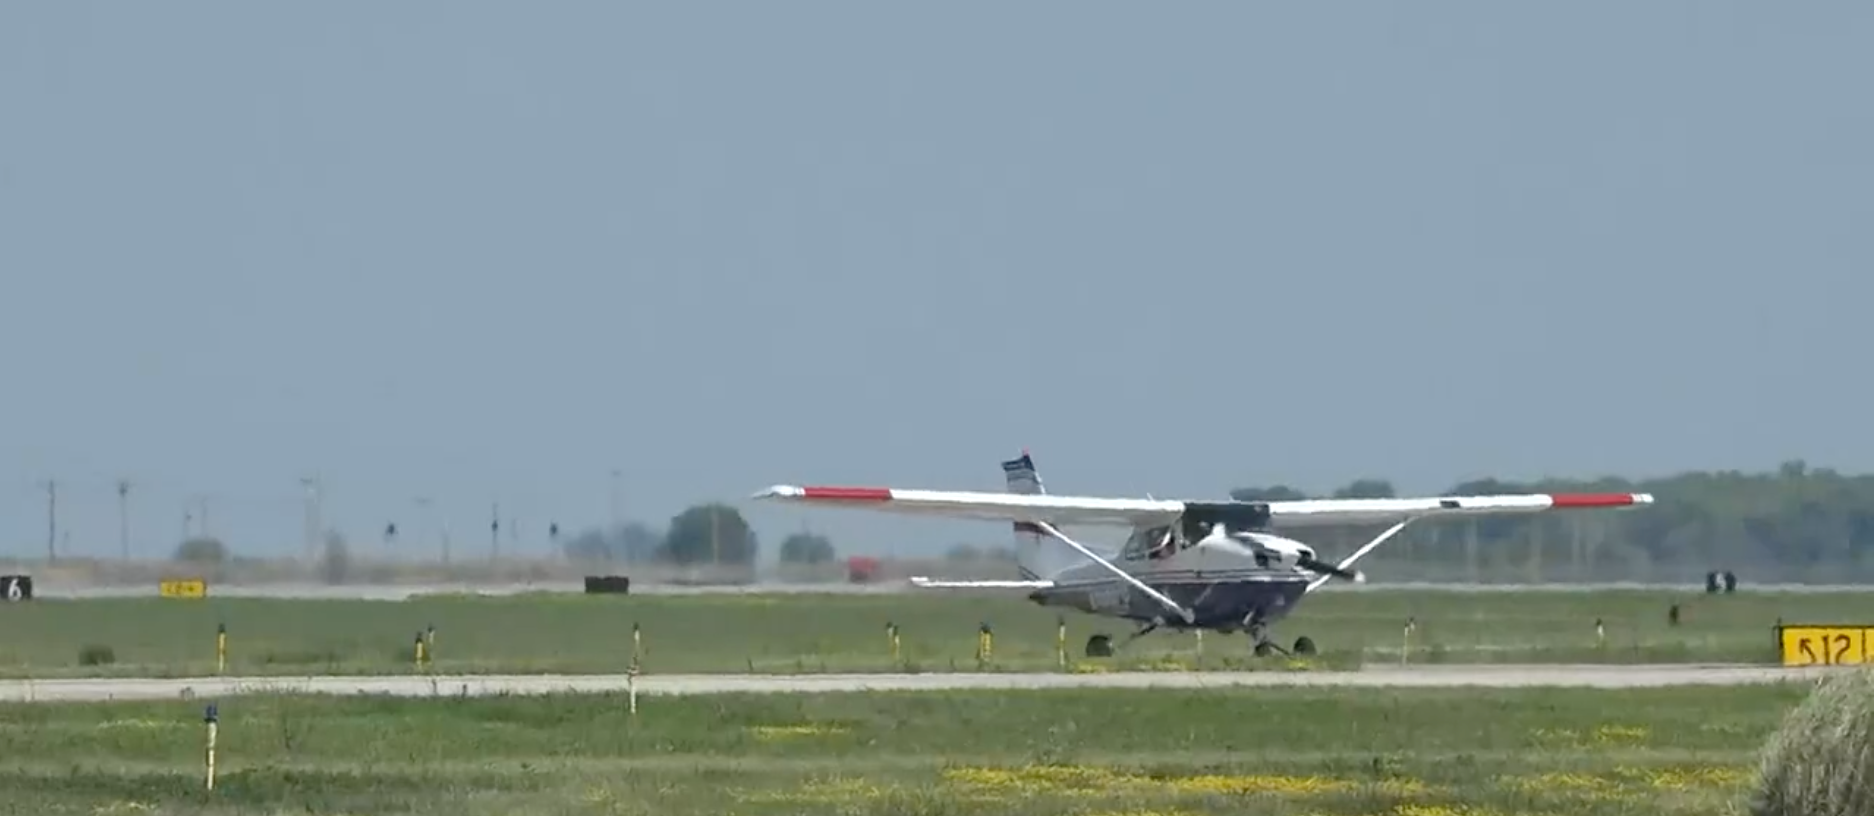 Civil Air Patrol lands new plane in North Platte